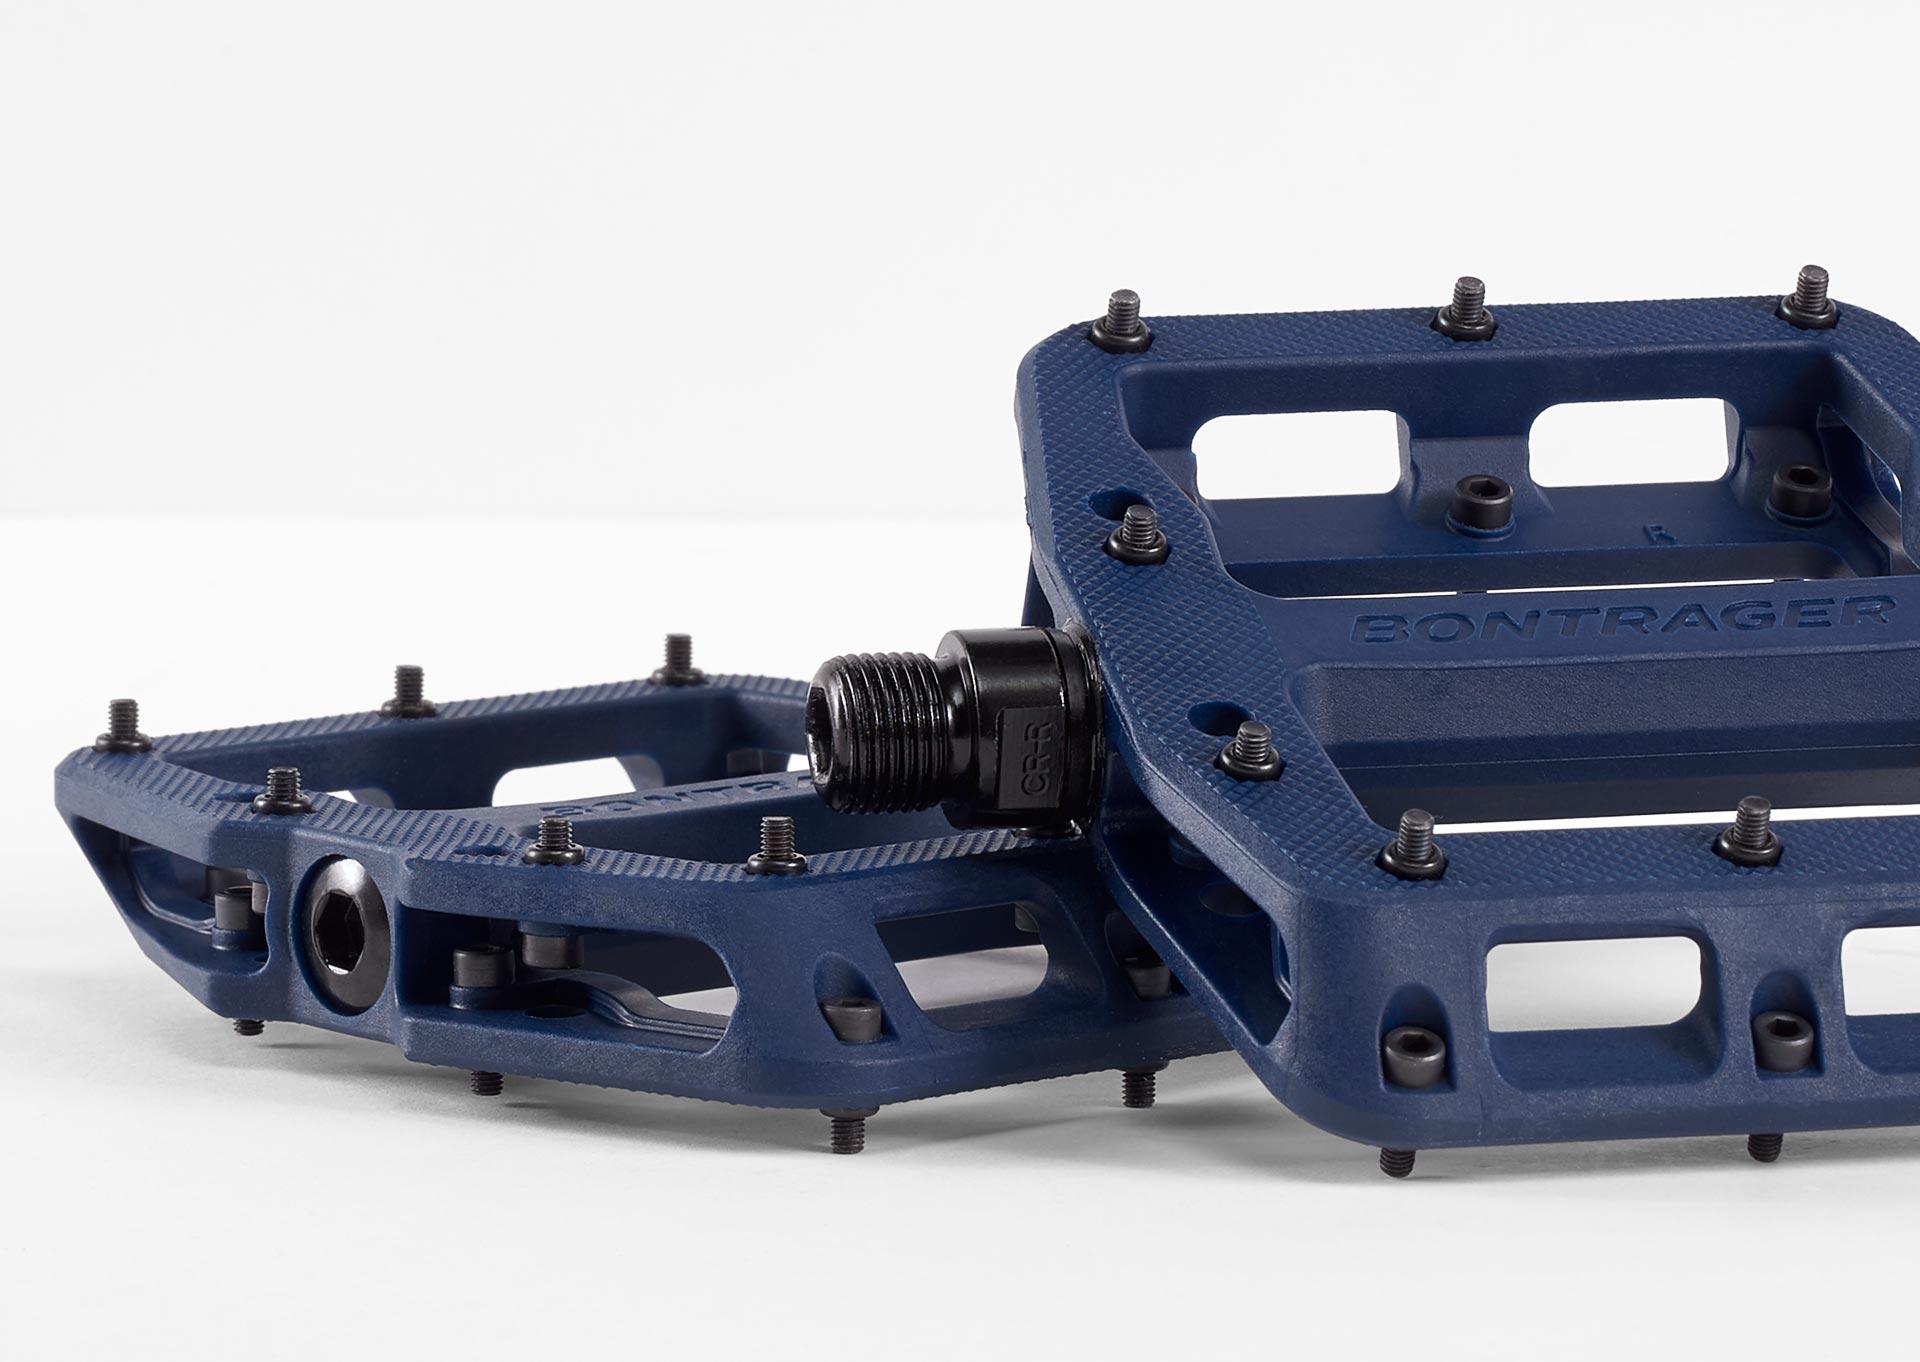 Blue platform pedals